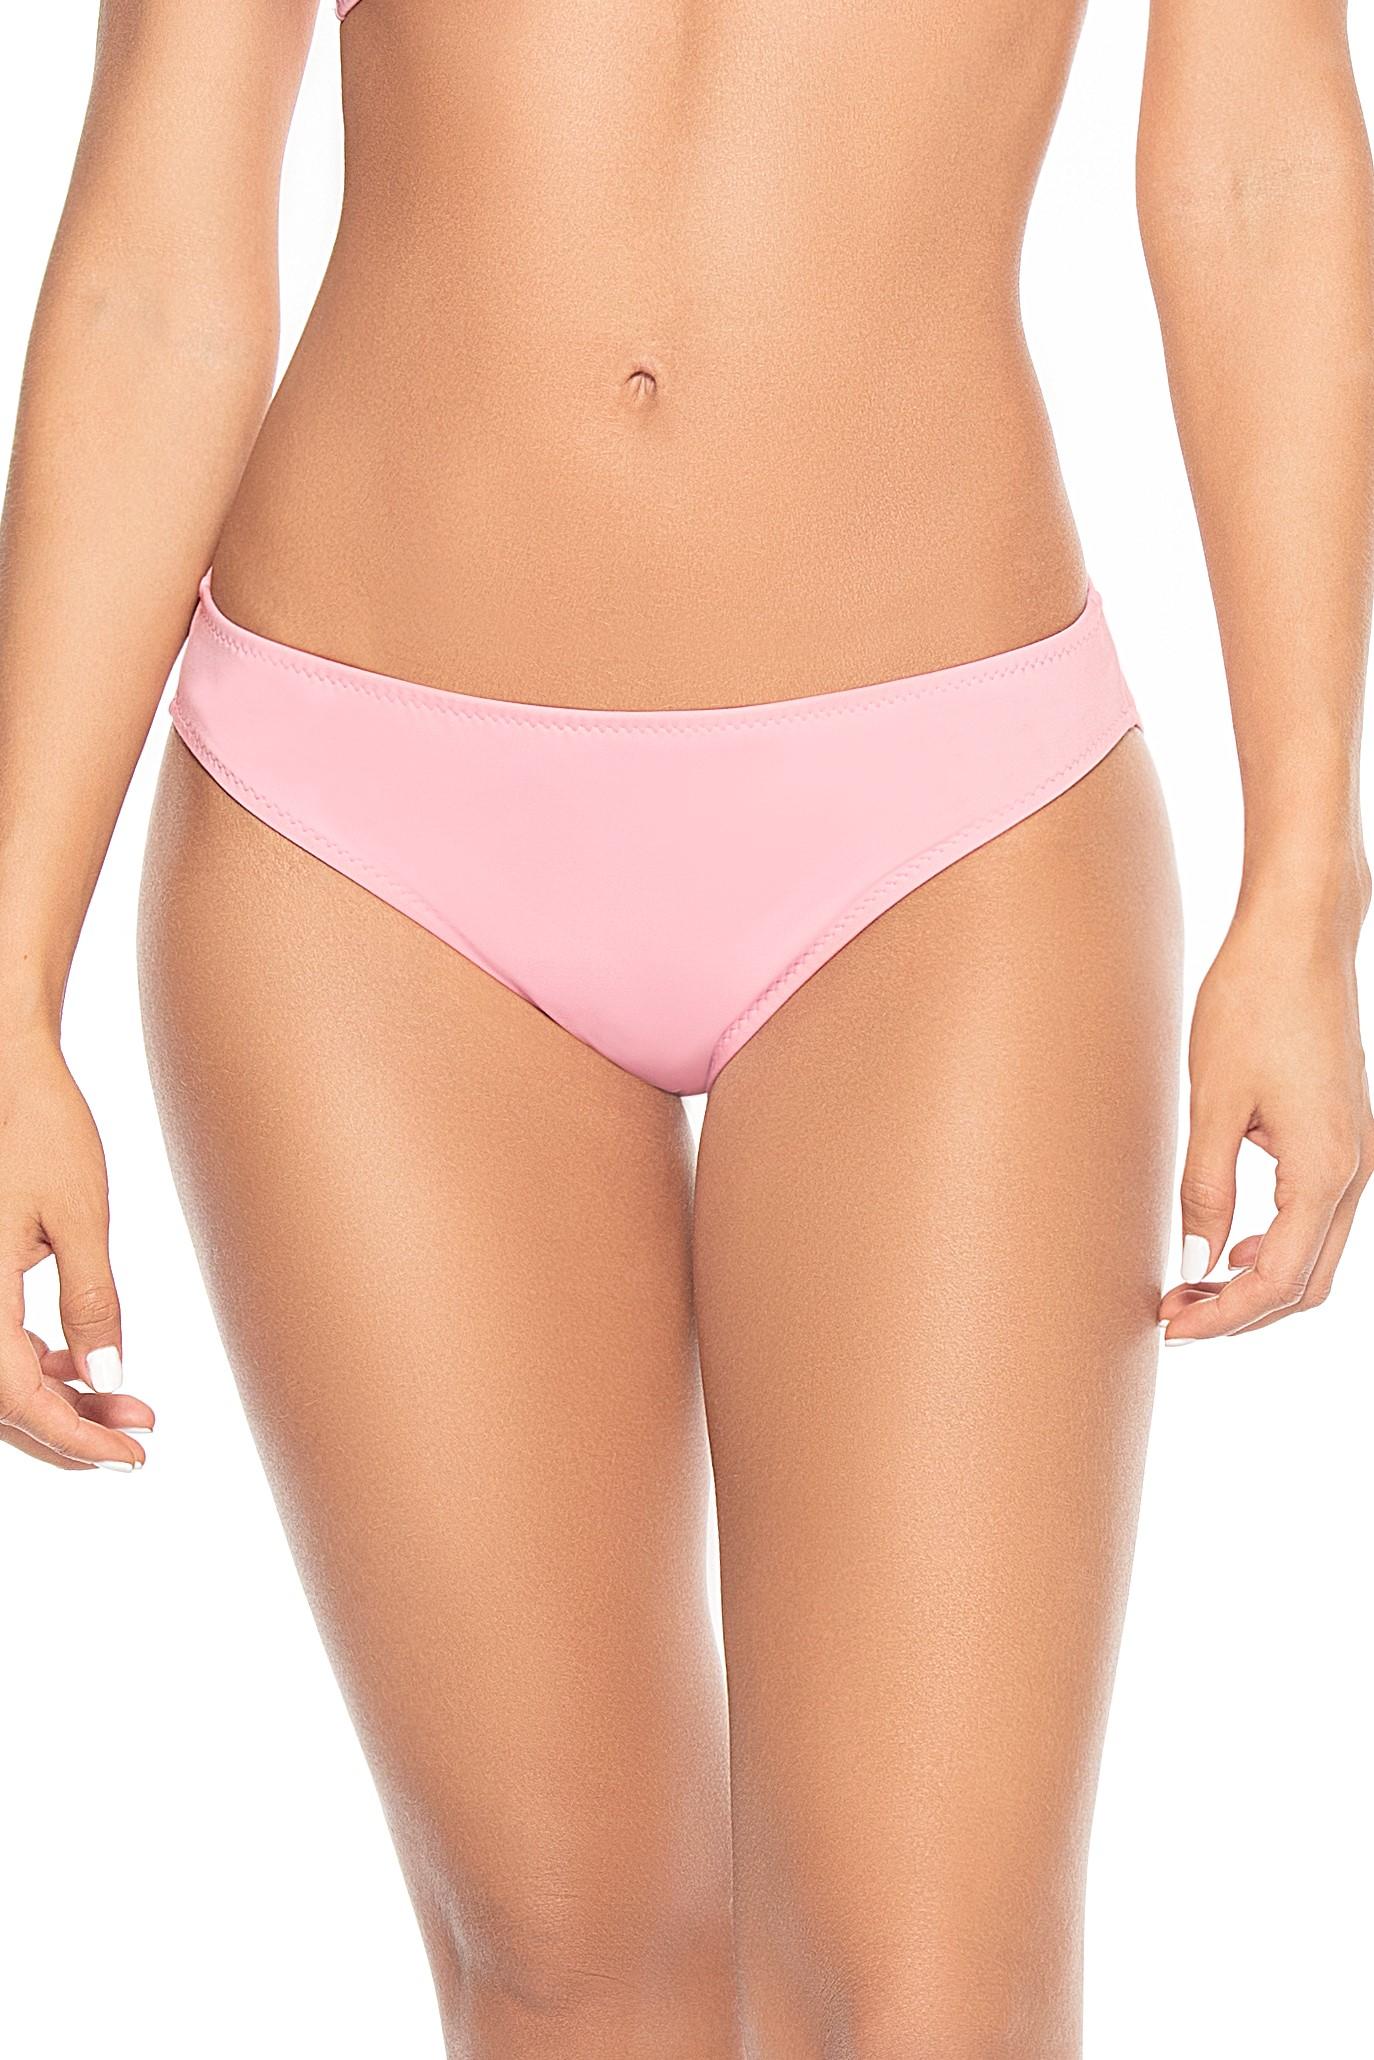 Phax Light Pink Full Bikini Bottom